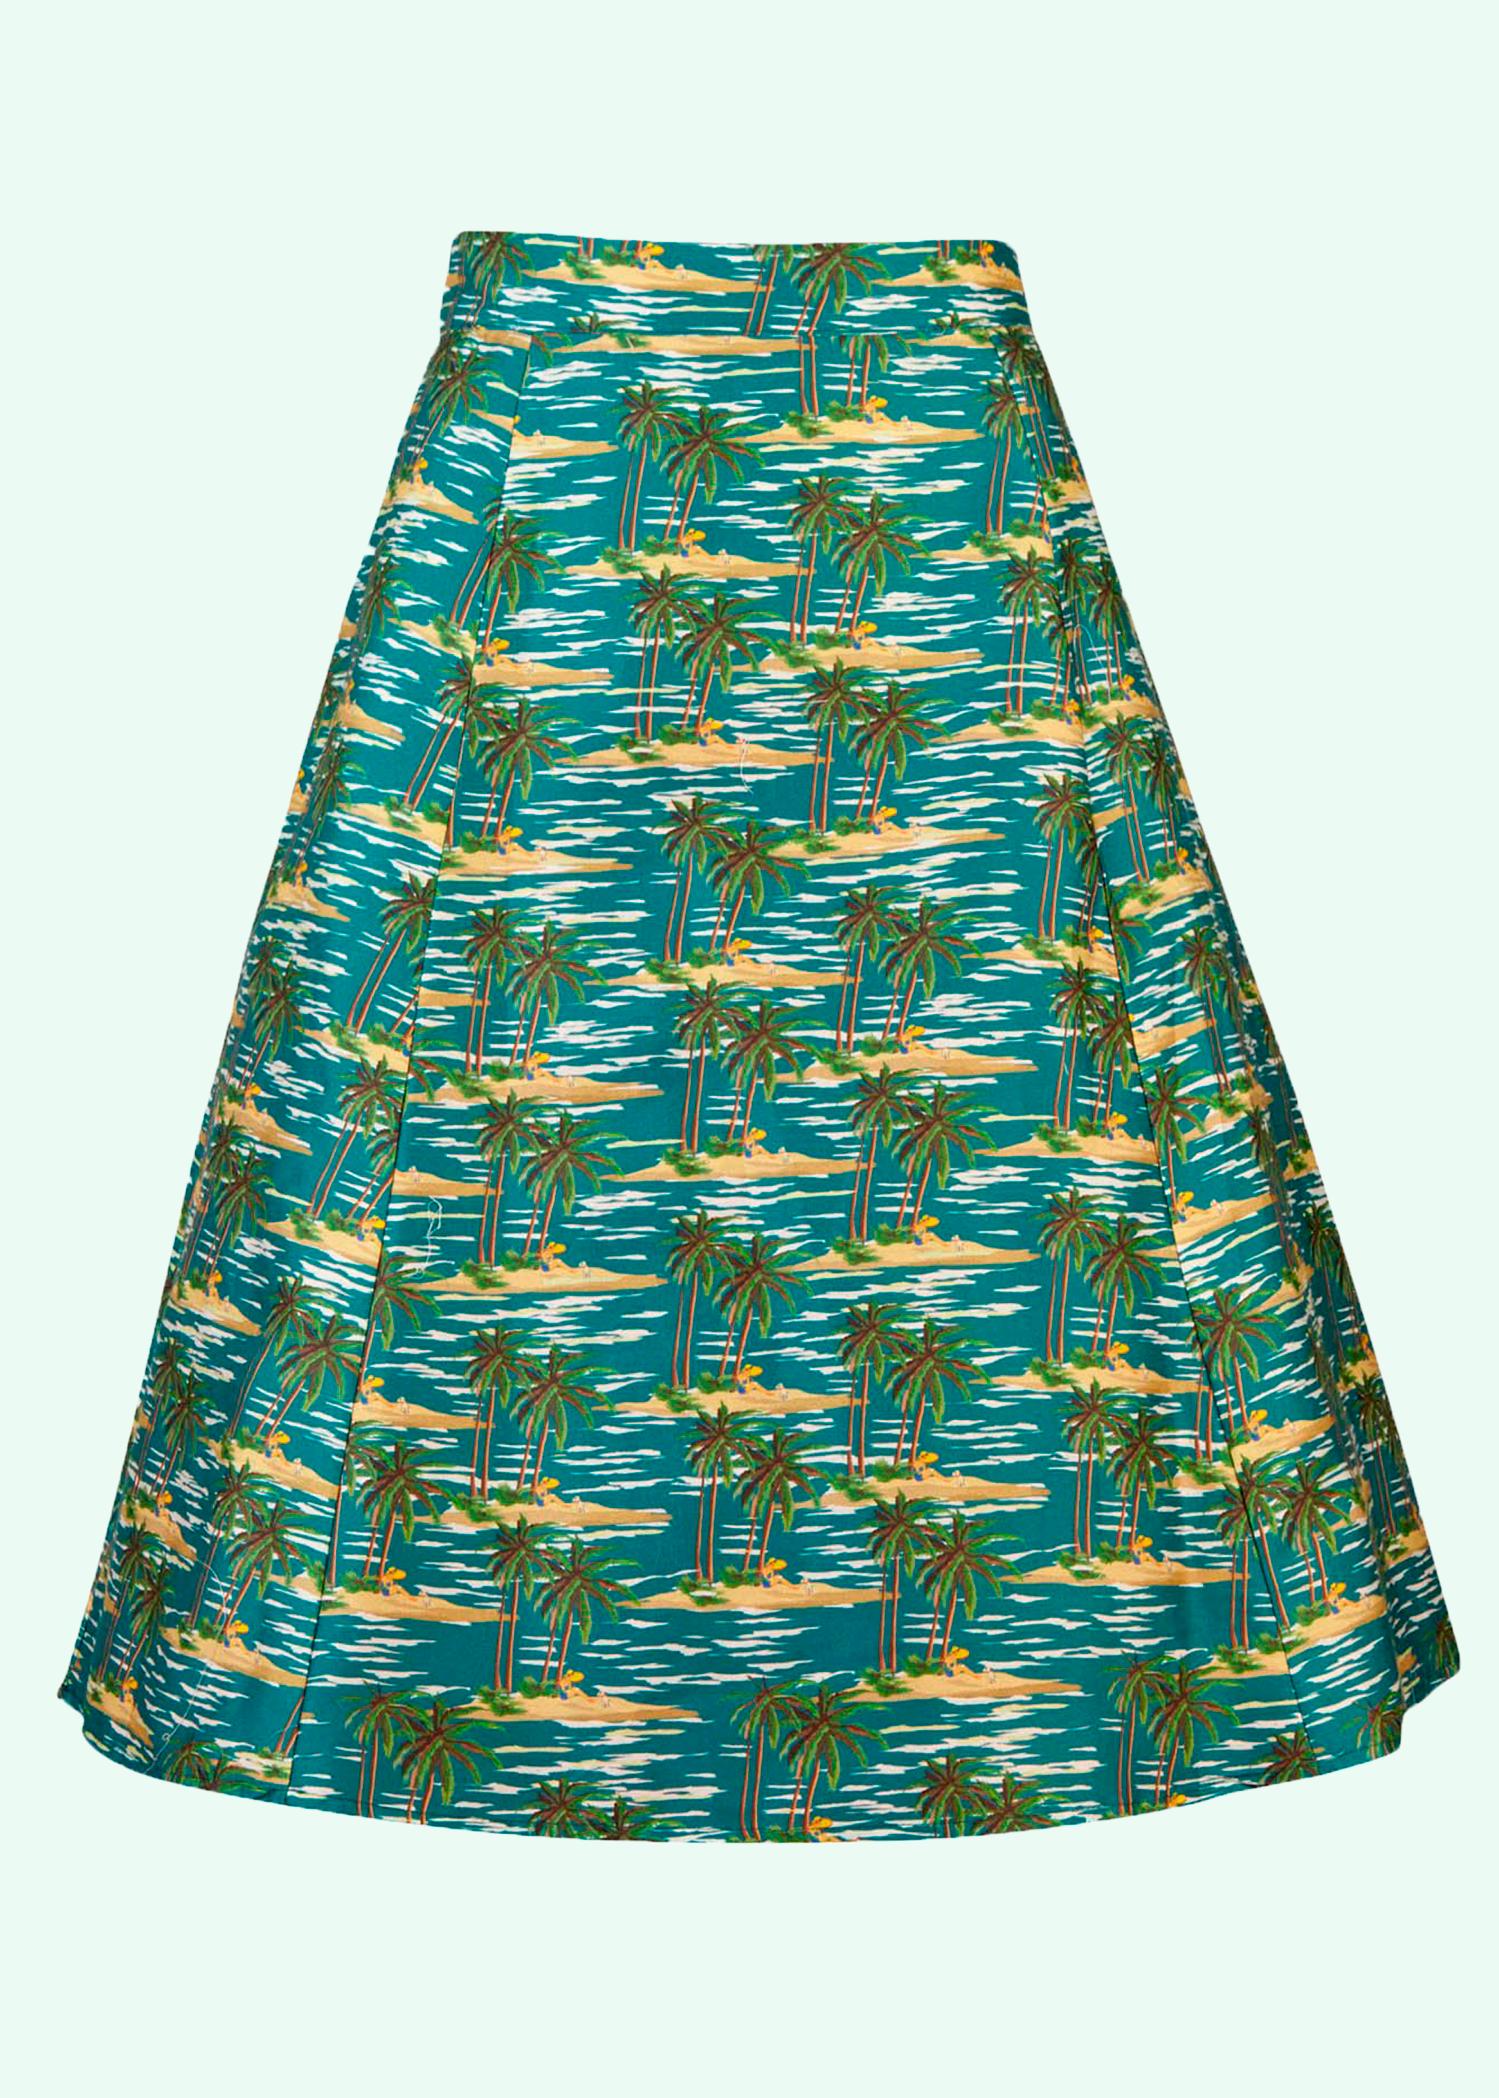 Aline nederdel fra Palava i bomuld med retro print at palmer